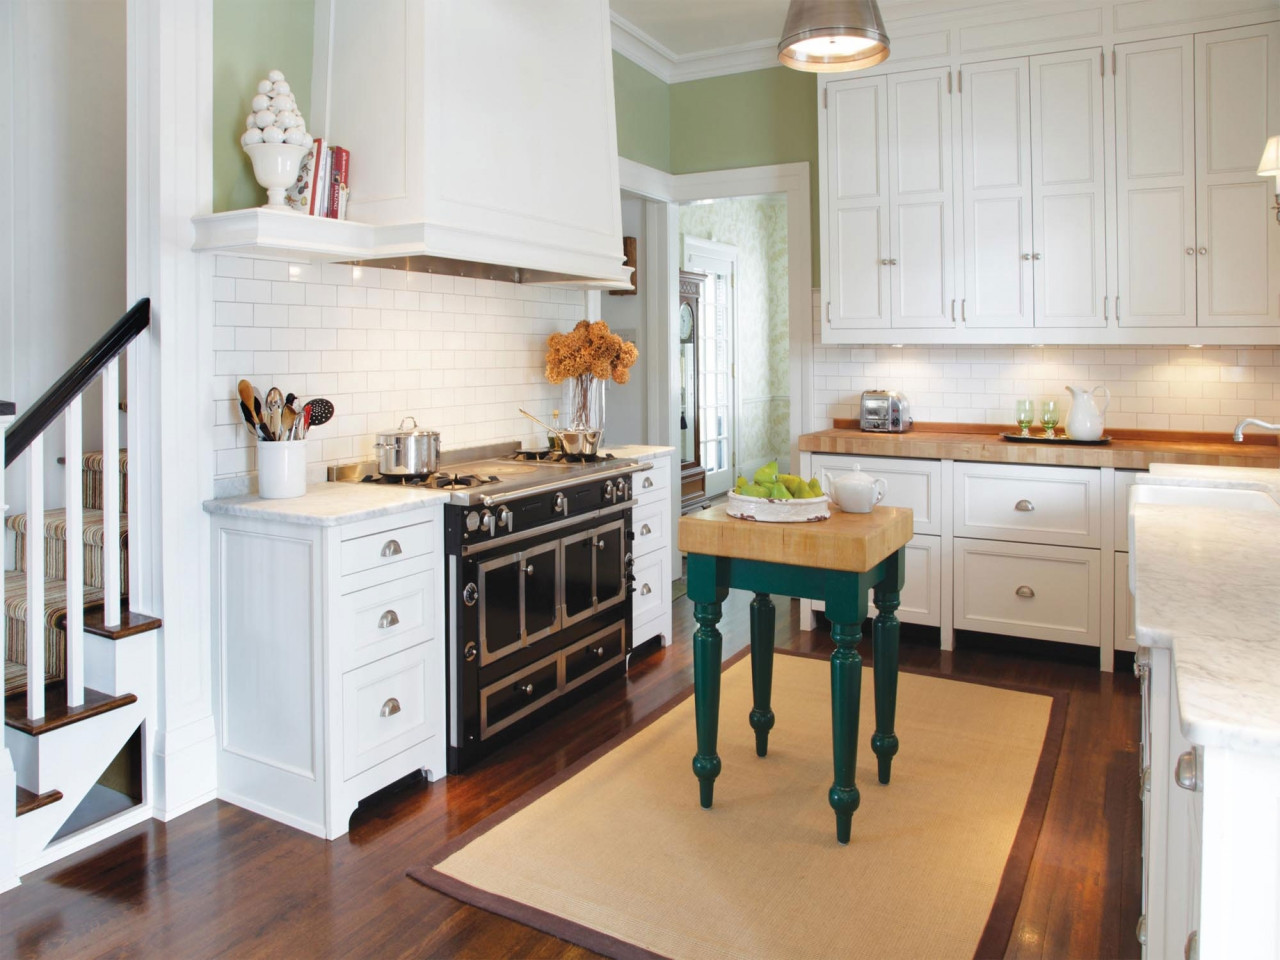 The Best Ideas for Menards Kitchen Design - Home ...